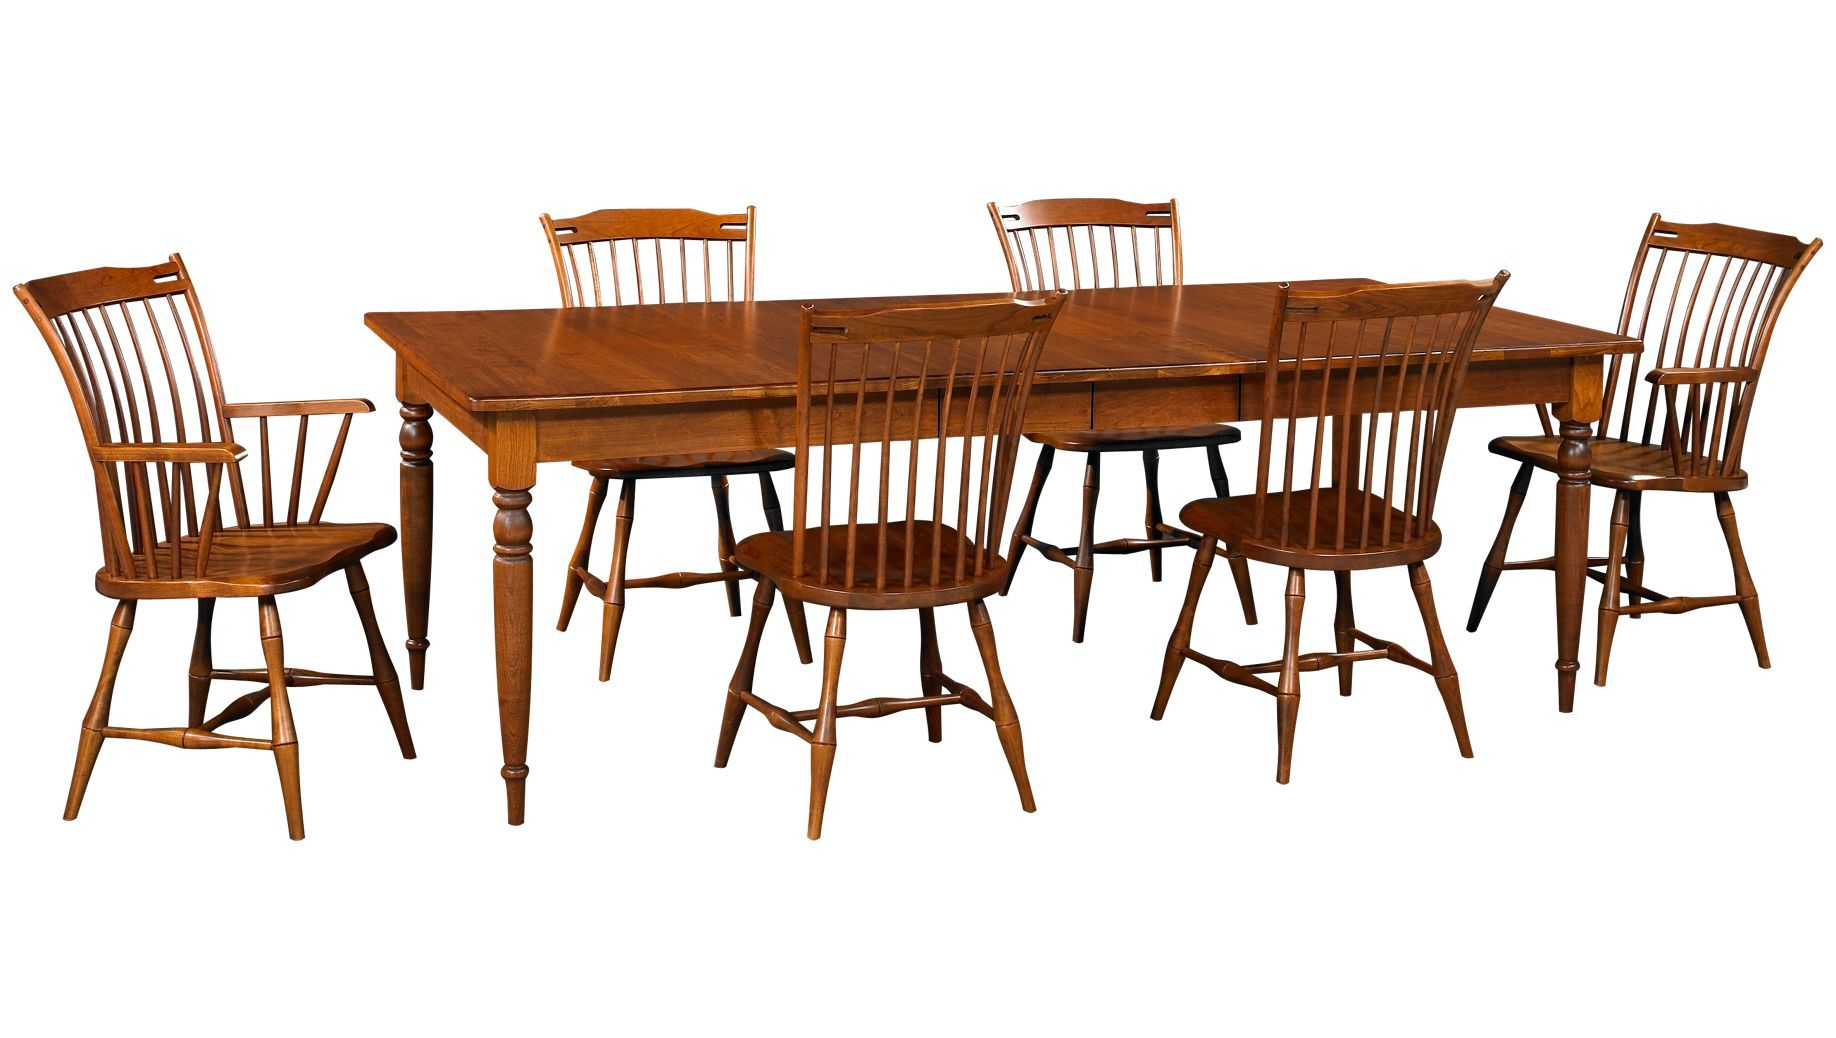 Caperton -Fairview-Fairview 7 Piece Dining Set - Jordan\'s Furniture ...